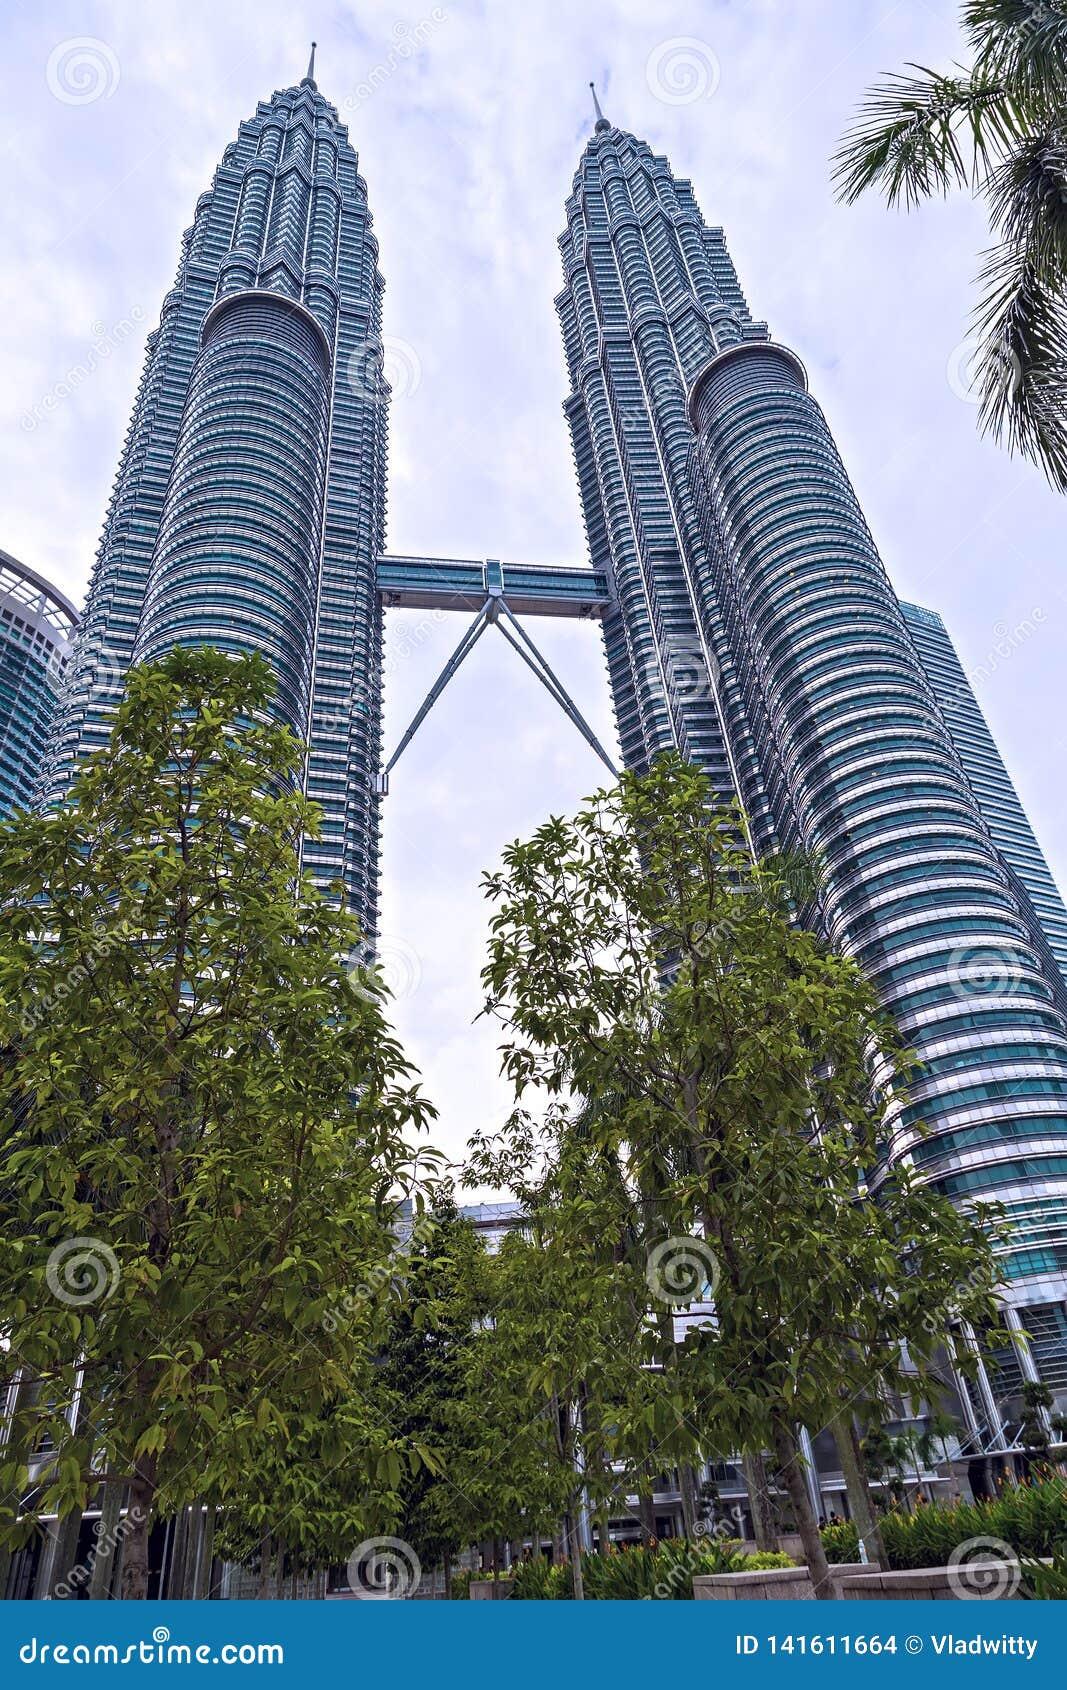 Petronas Klcc Twin Towers Buildings Are A Landmark Of Kuala